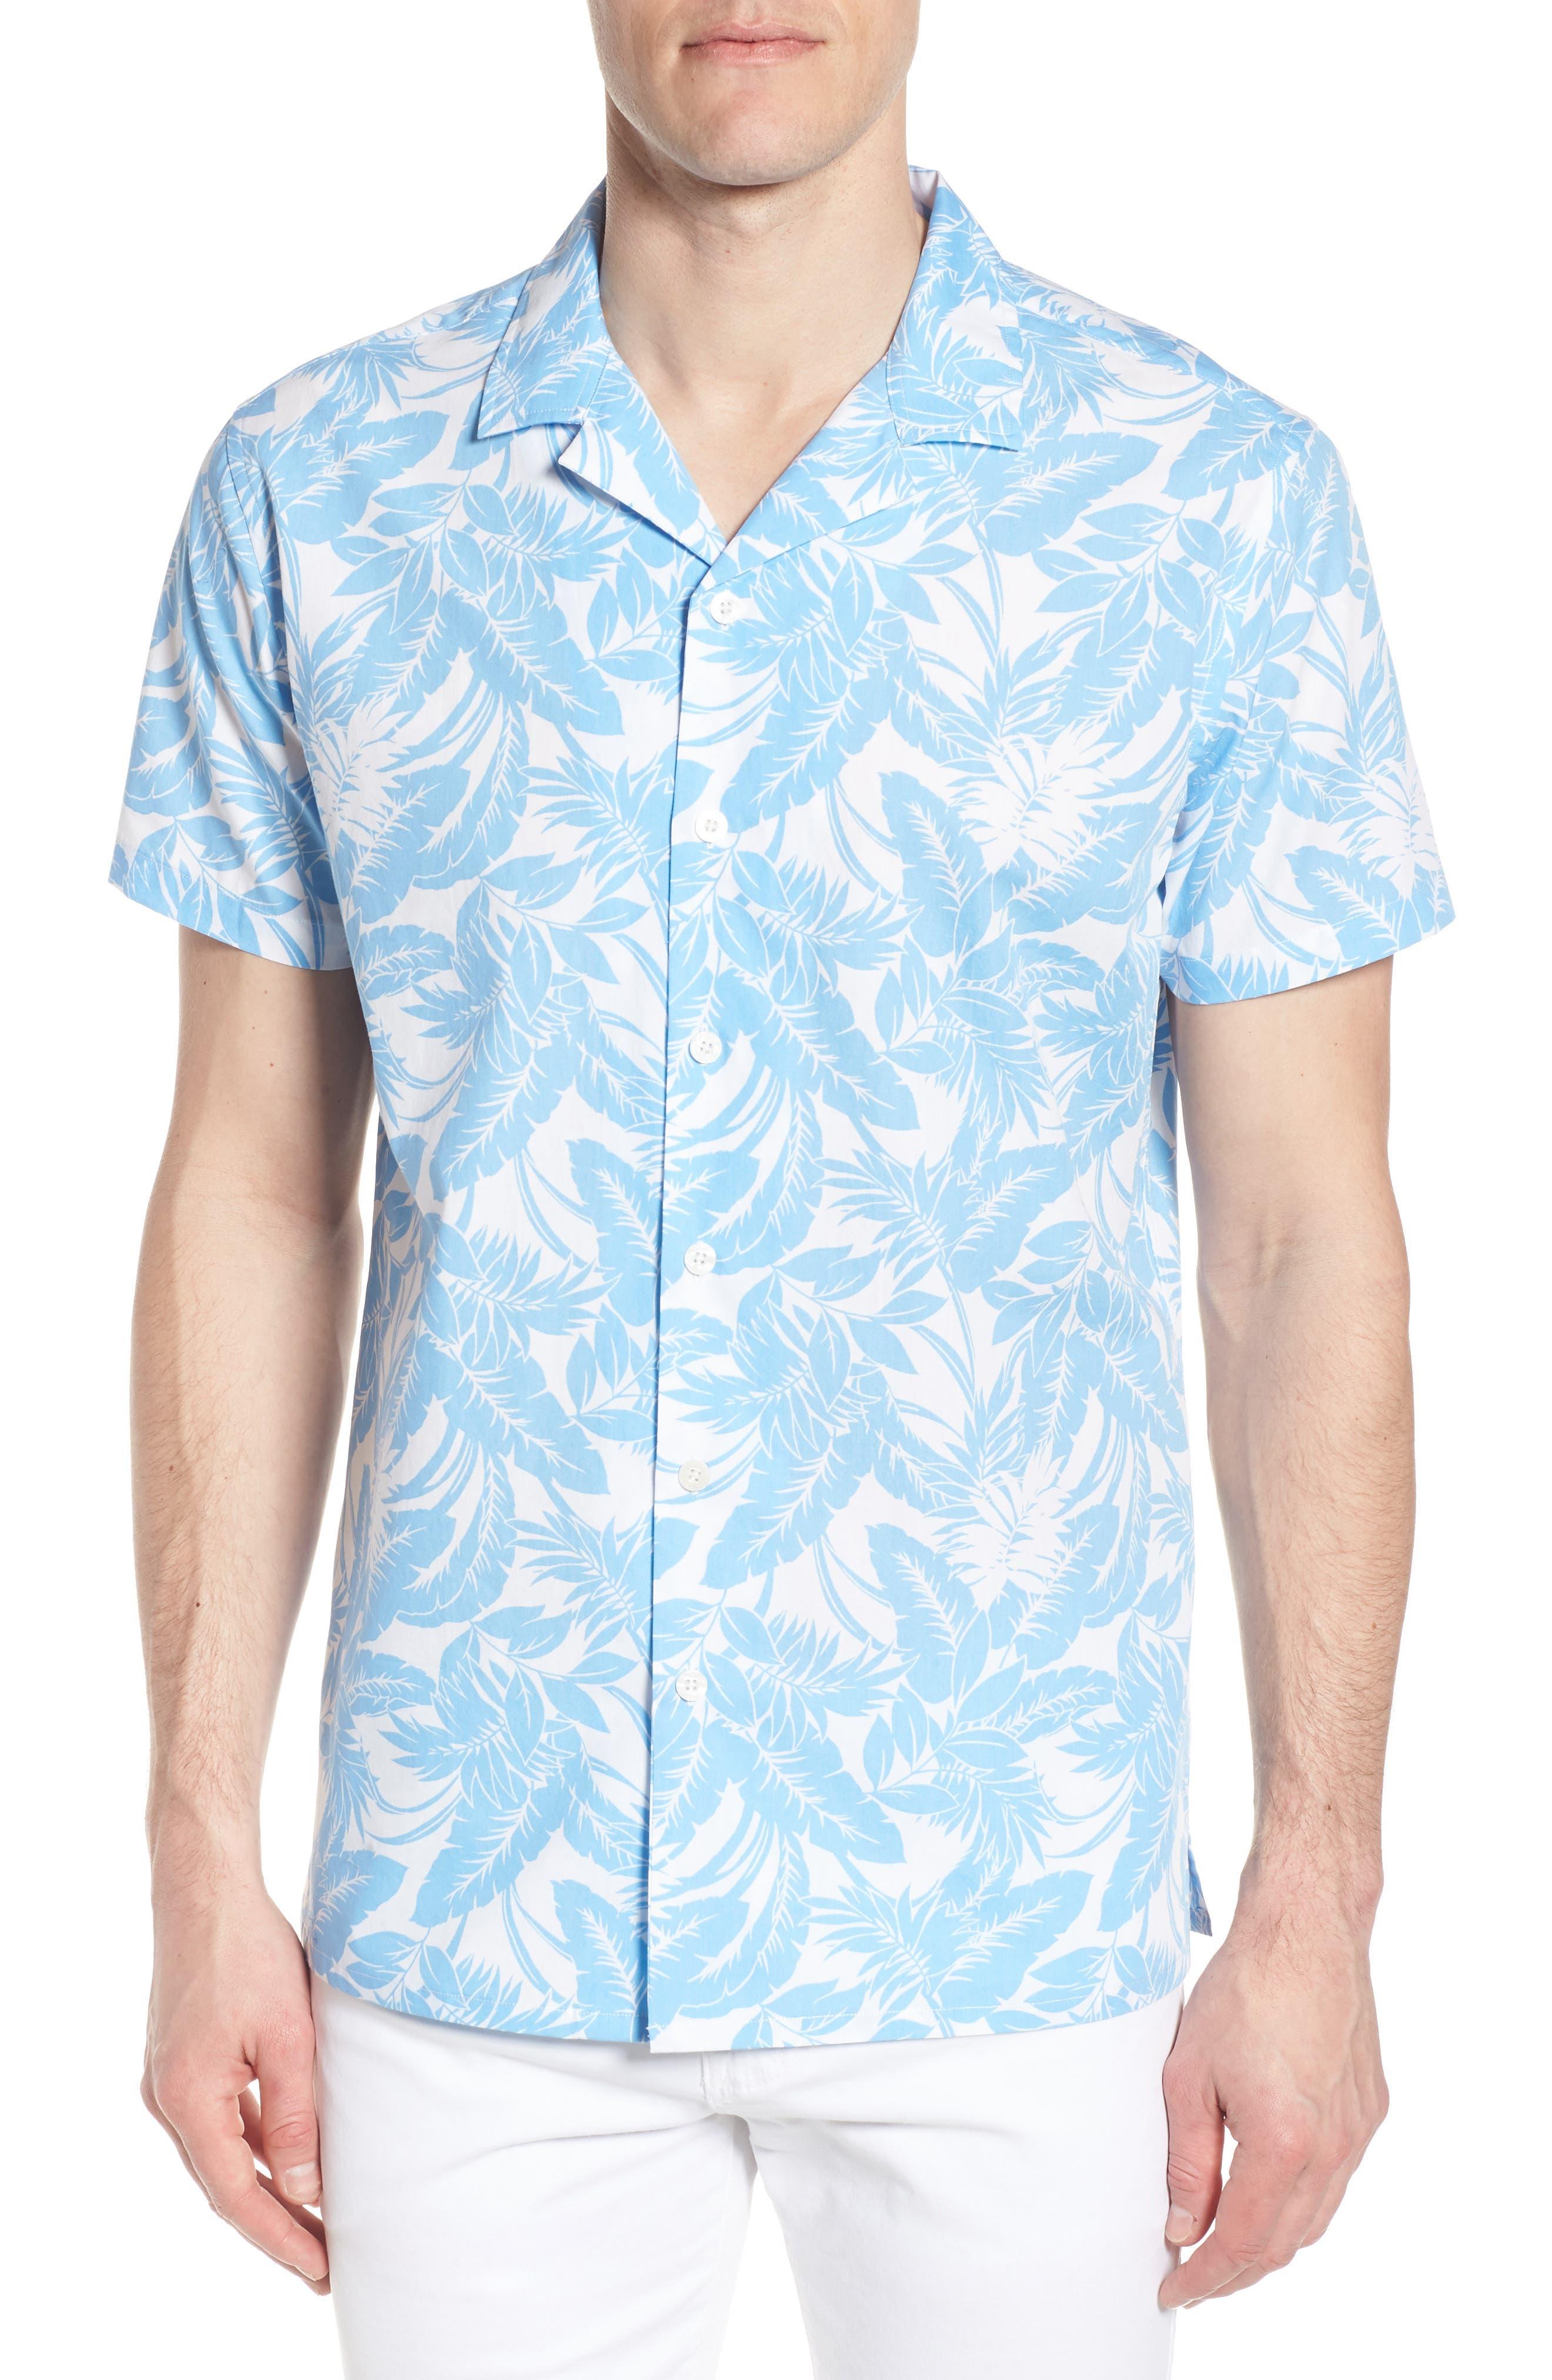 Camp Ventu Regular Fit Short Sleeve Sport Shirt,                             Main thumbnail 1, color,                             Sky